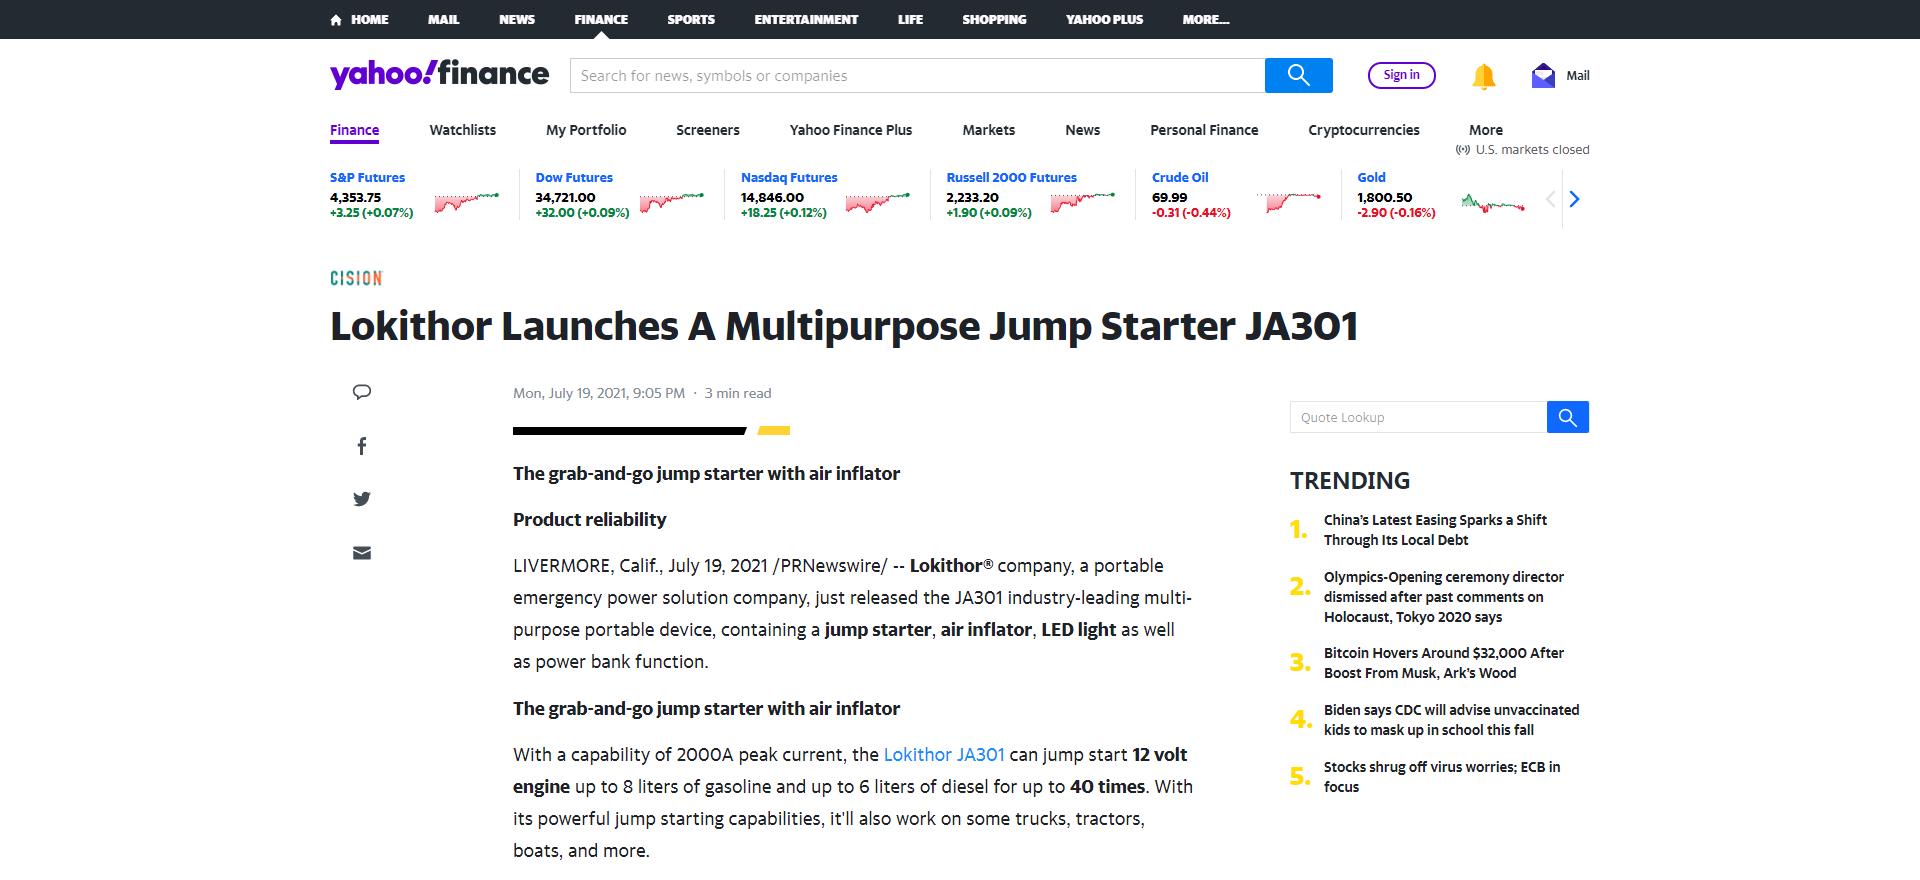 Lokithor推出了一款多功能应急启动电源JA301 法国 雅虎报道